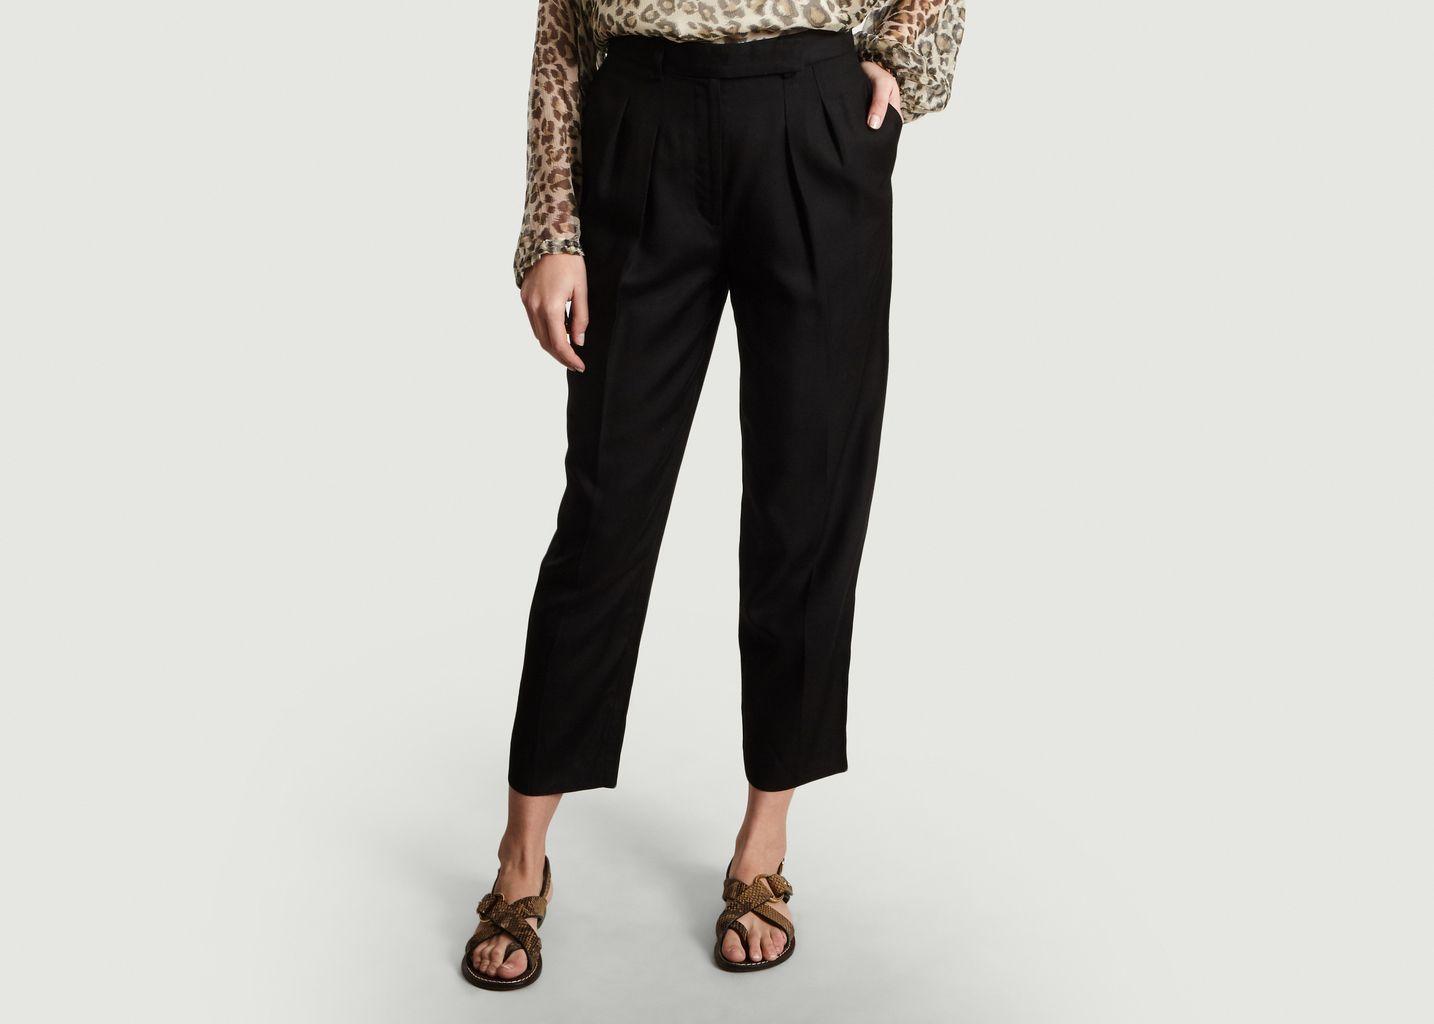 Pantalon A Pinces 7/8e Cheryl - A.P.C.